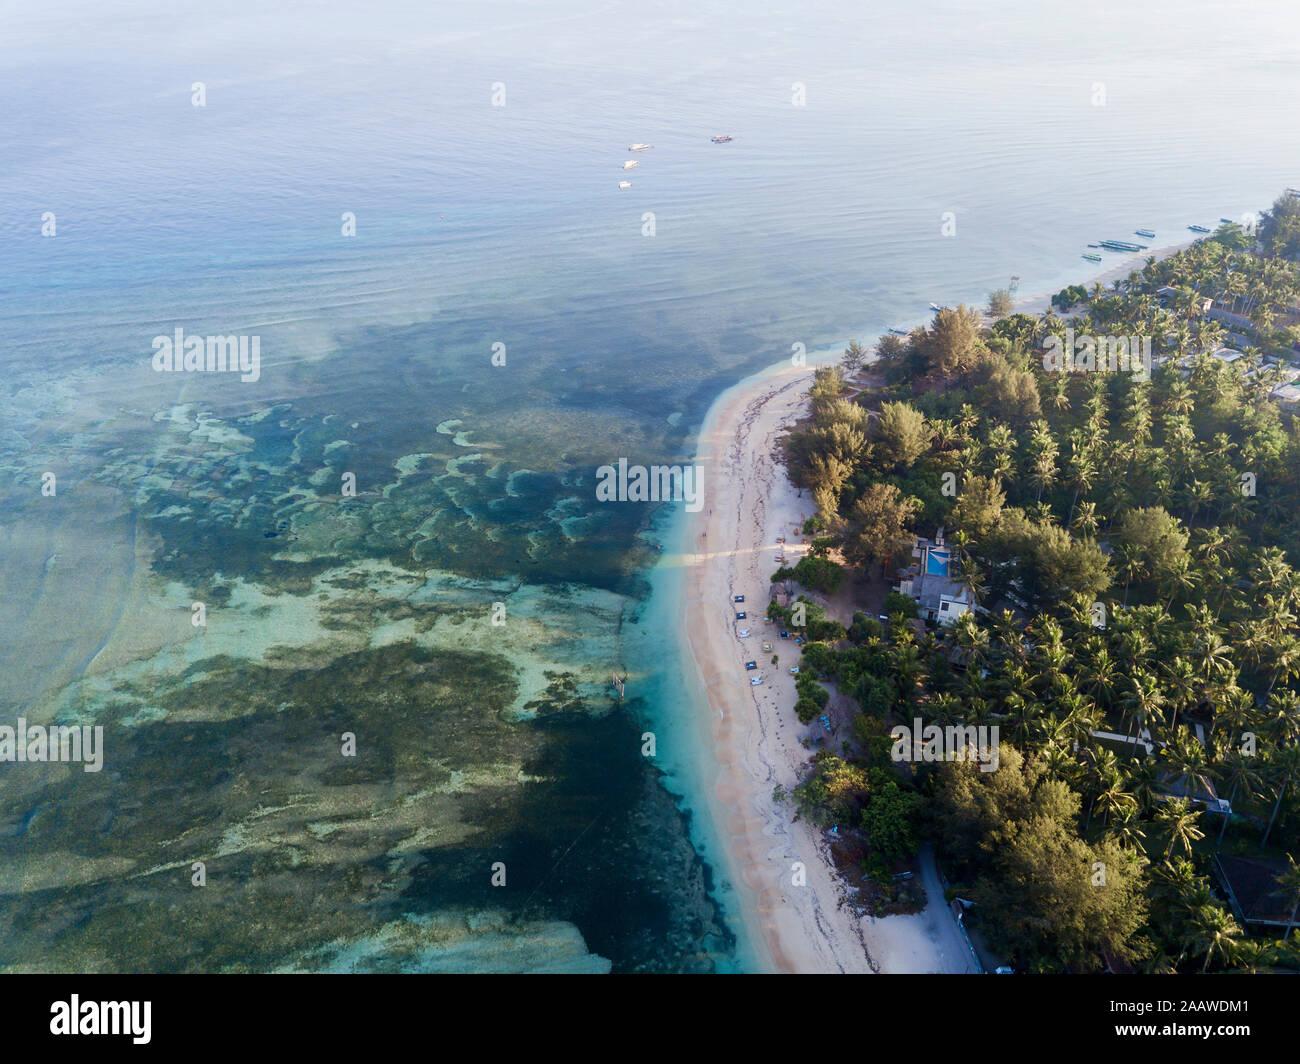 Vista escénica de antena Gili-Air isla de Bali, Indonesia Foto de stock